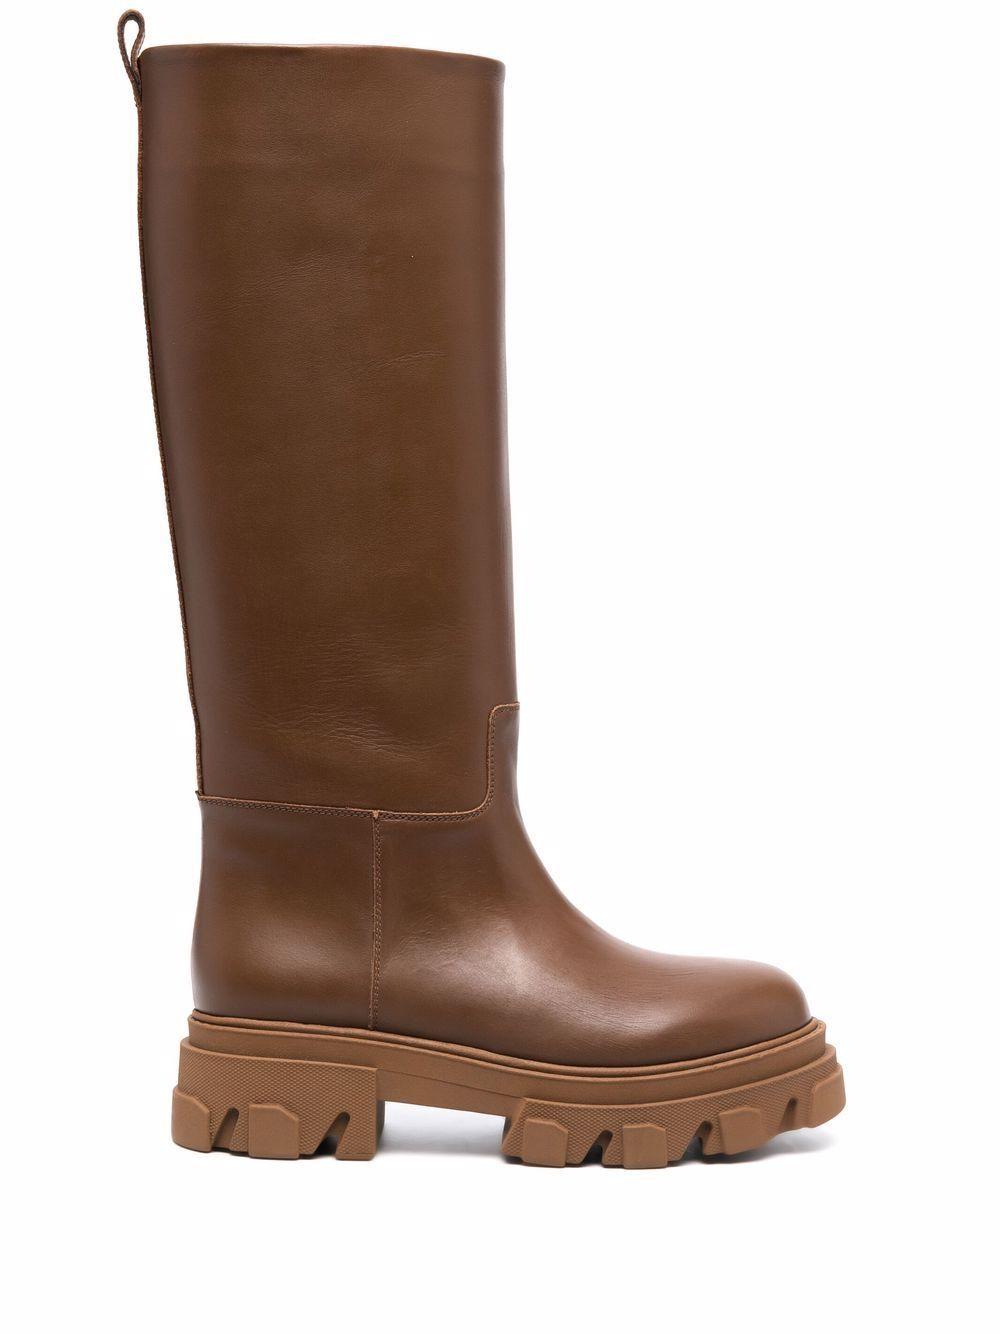 Combat boot leather